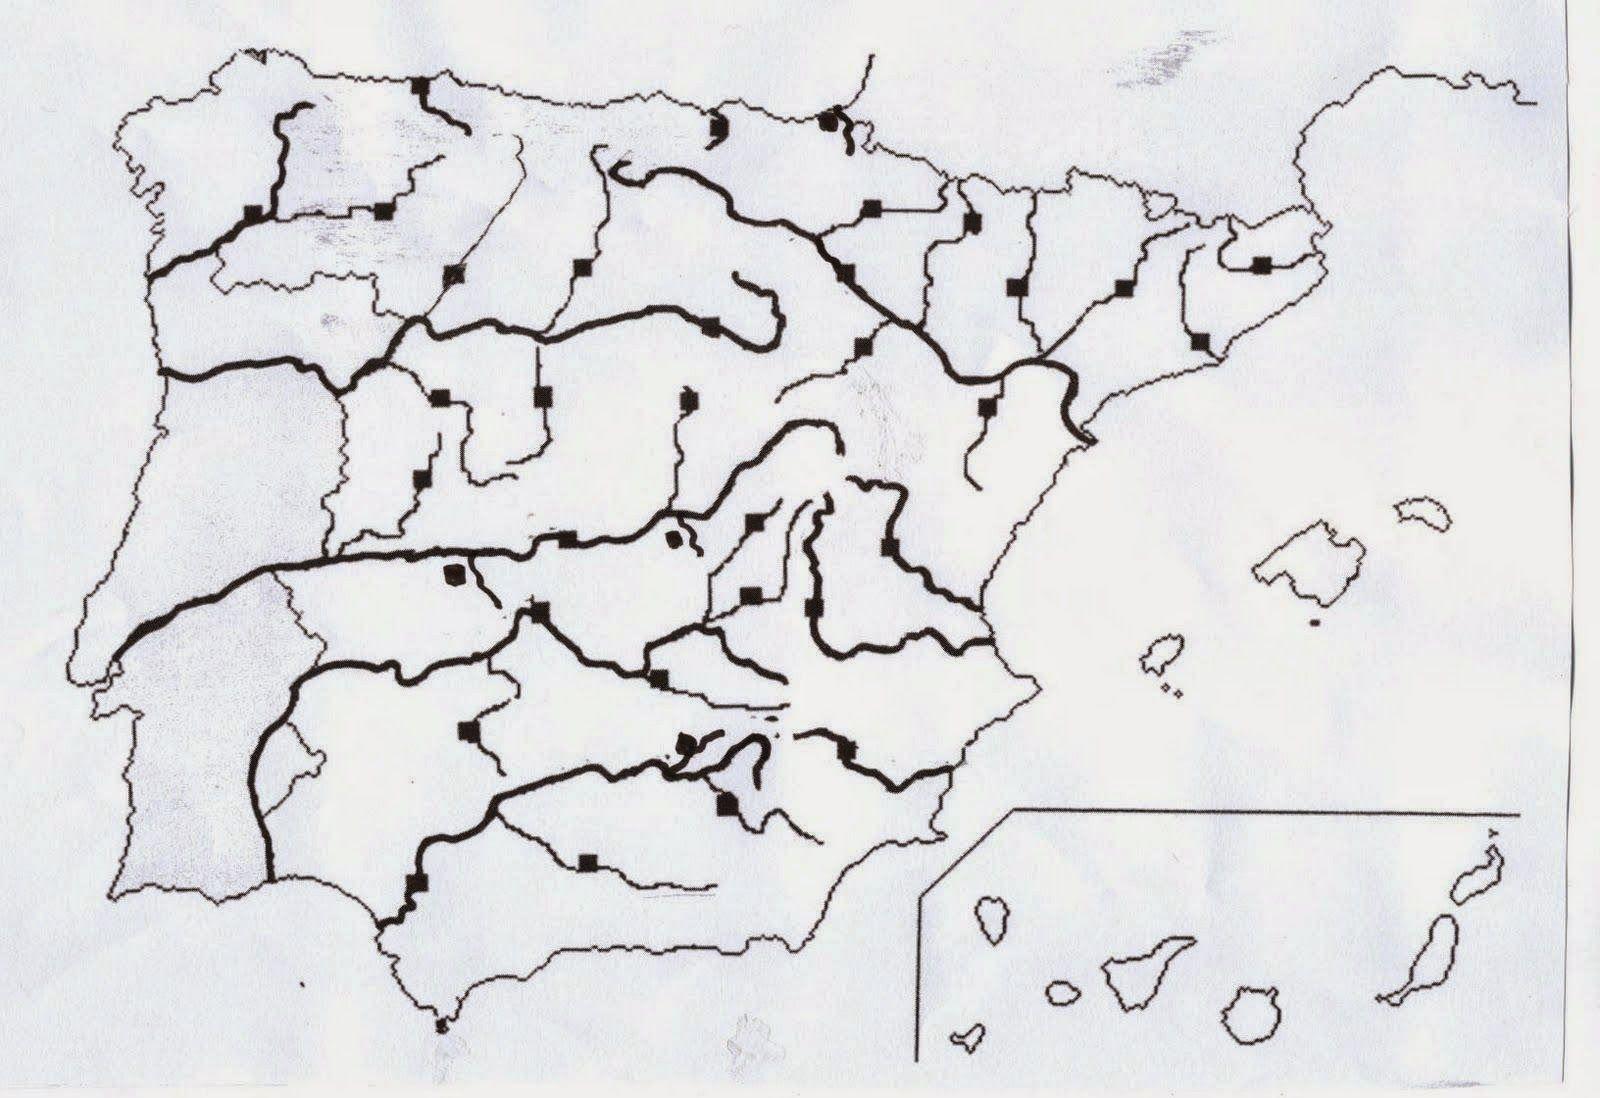 Mapa De España Mudo Rios Para Imprimir.Resultado De Imagen De Mapa Fisico De Espana Para Rellenar